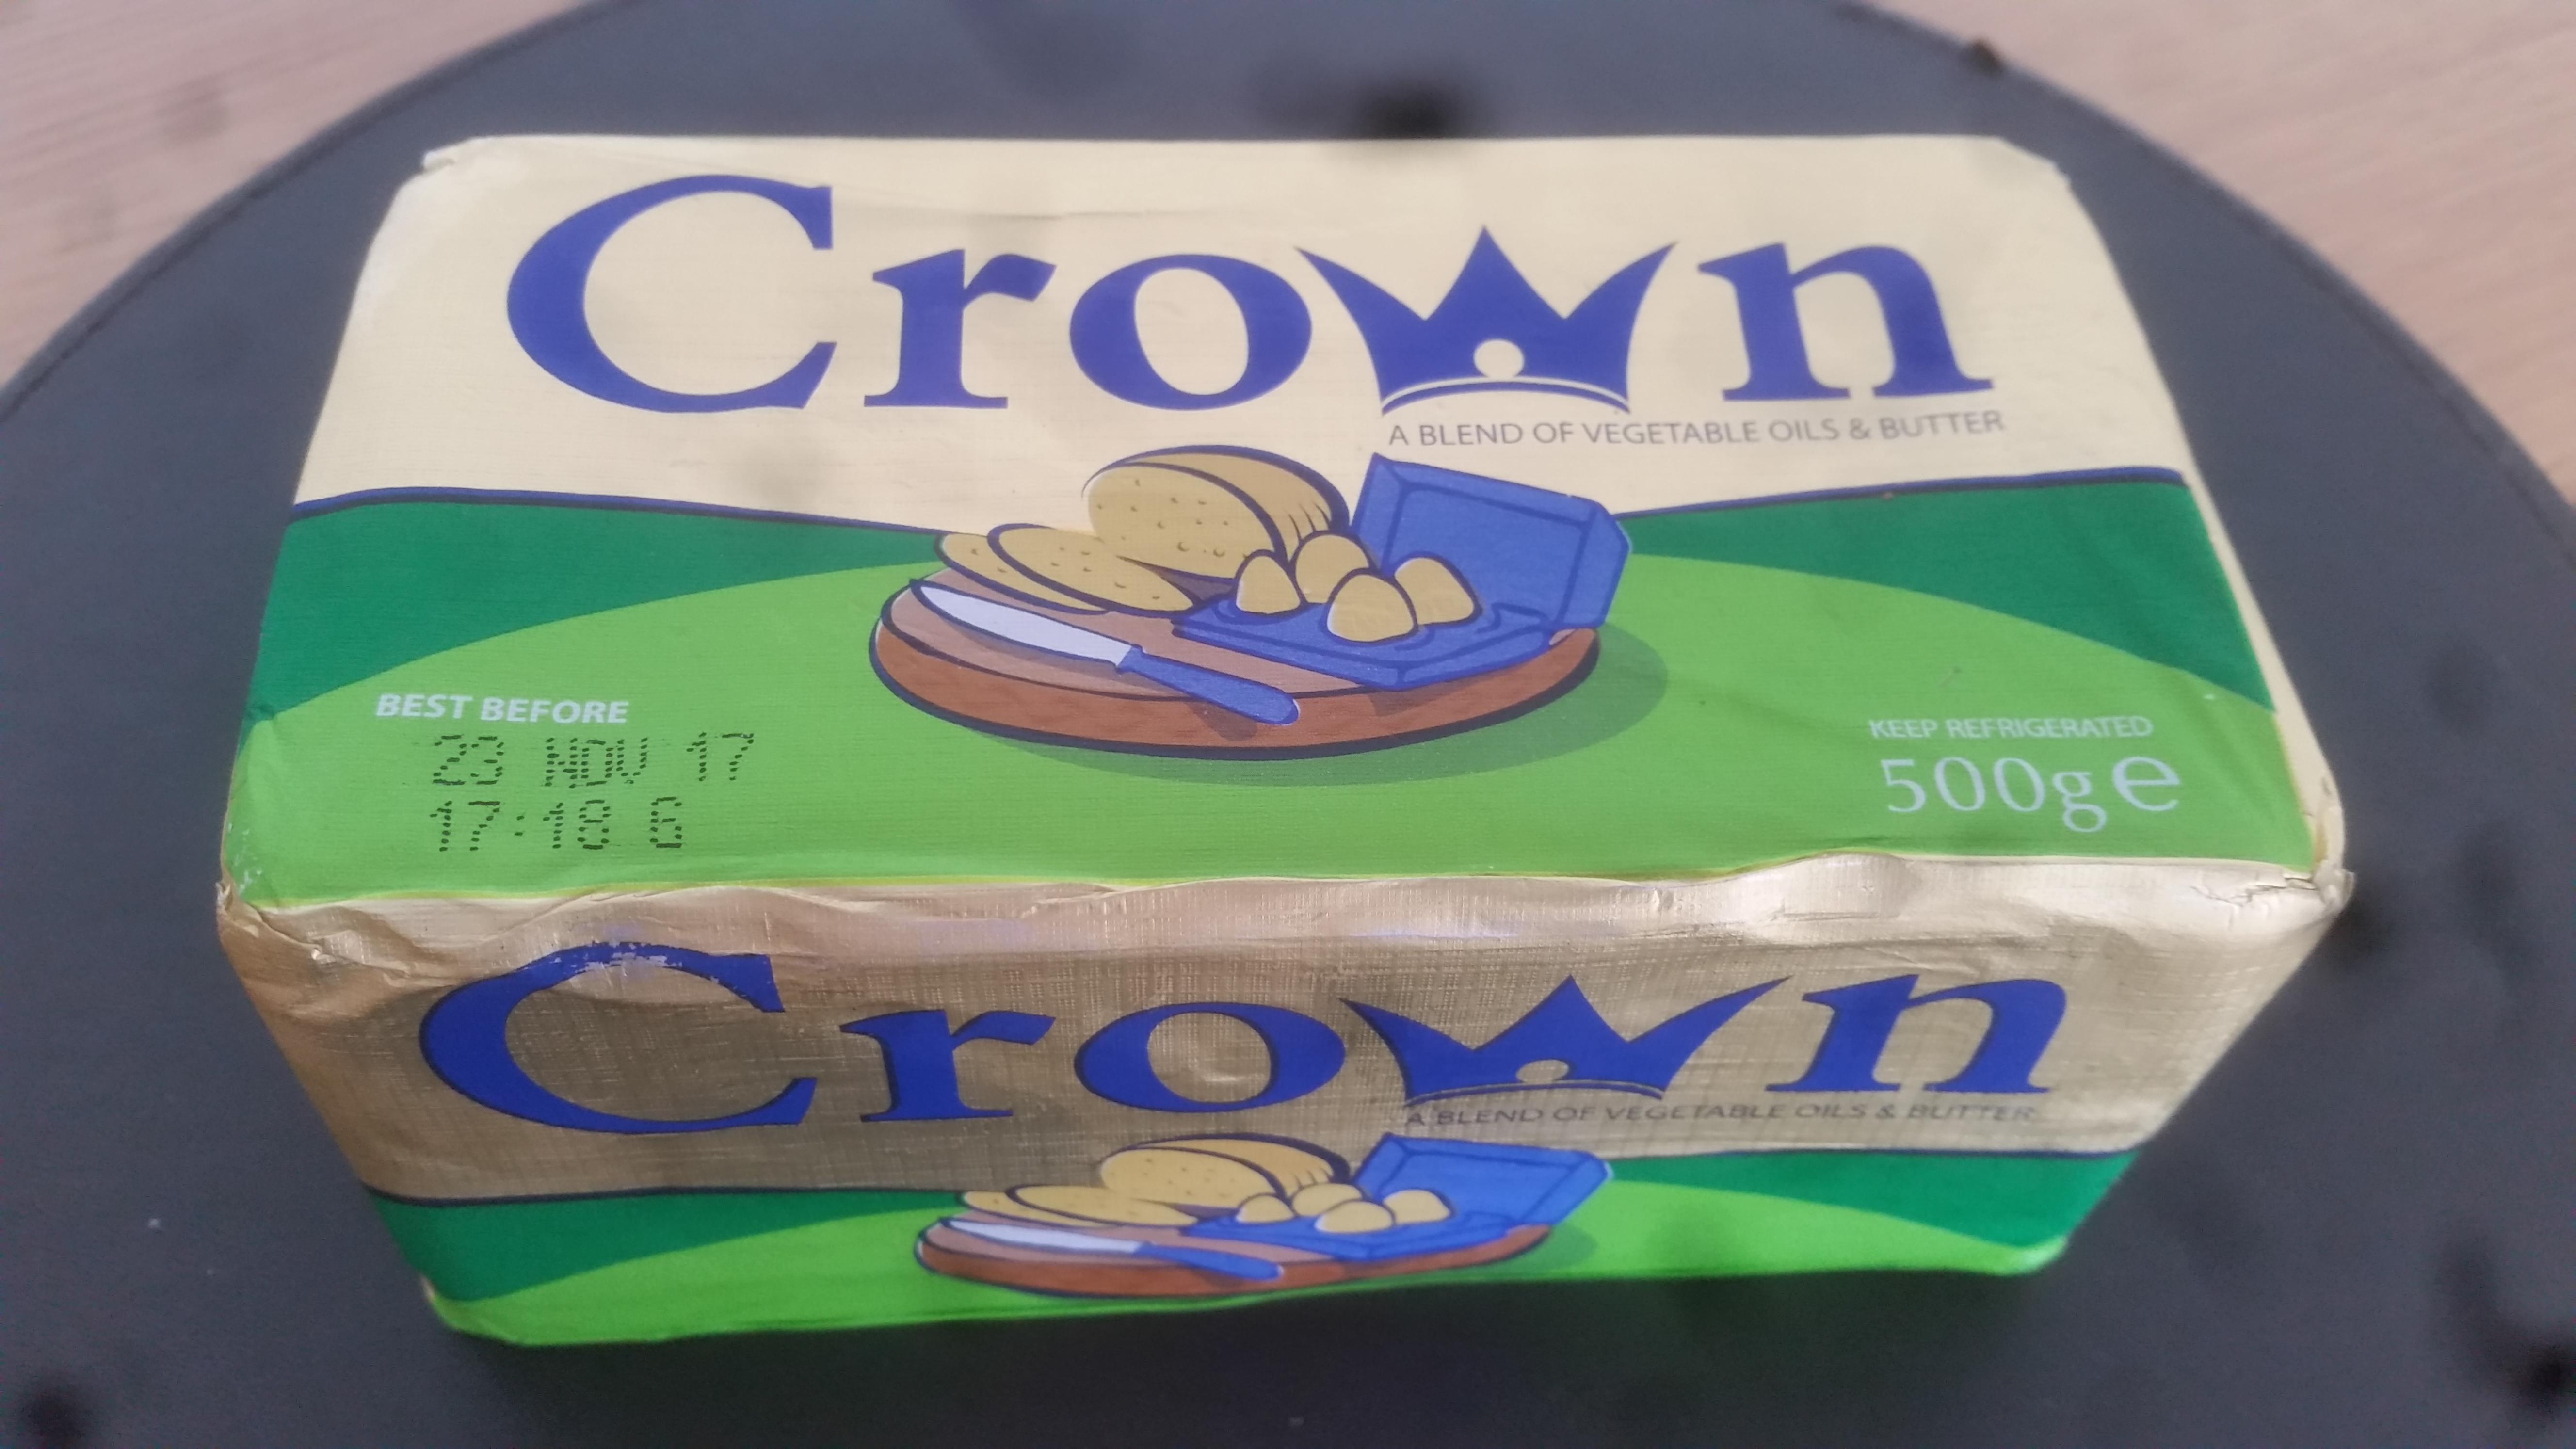 Crown blended Butter 500g block  90p @ Asda instore